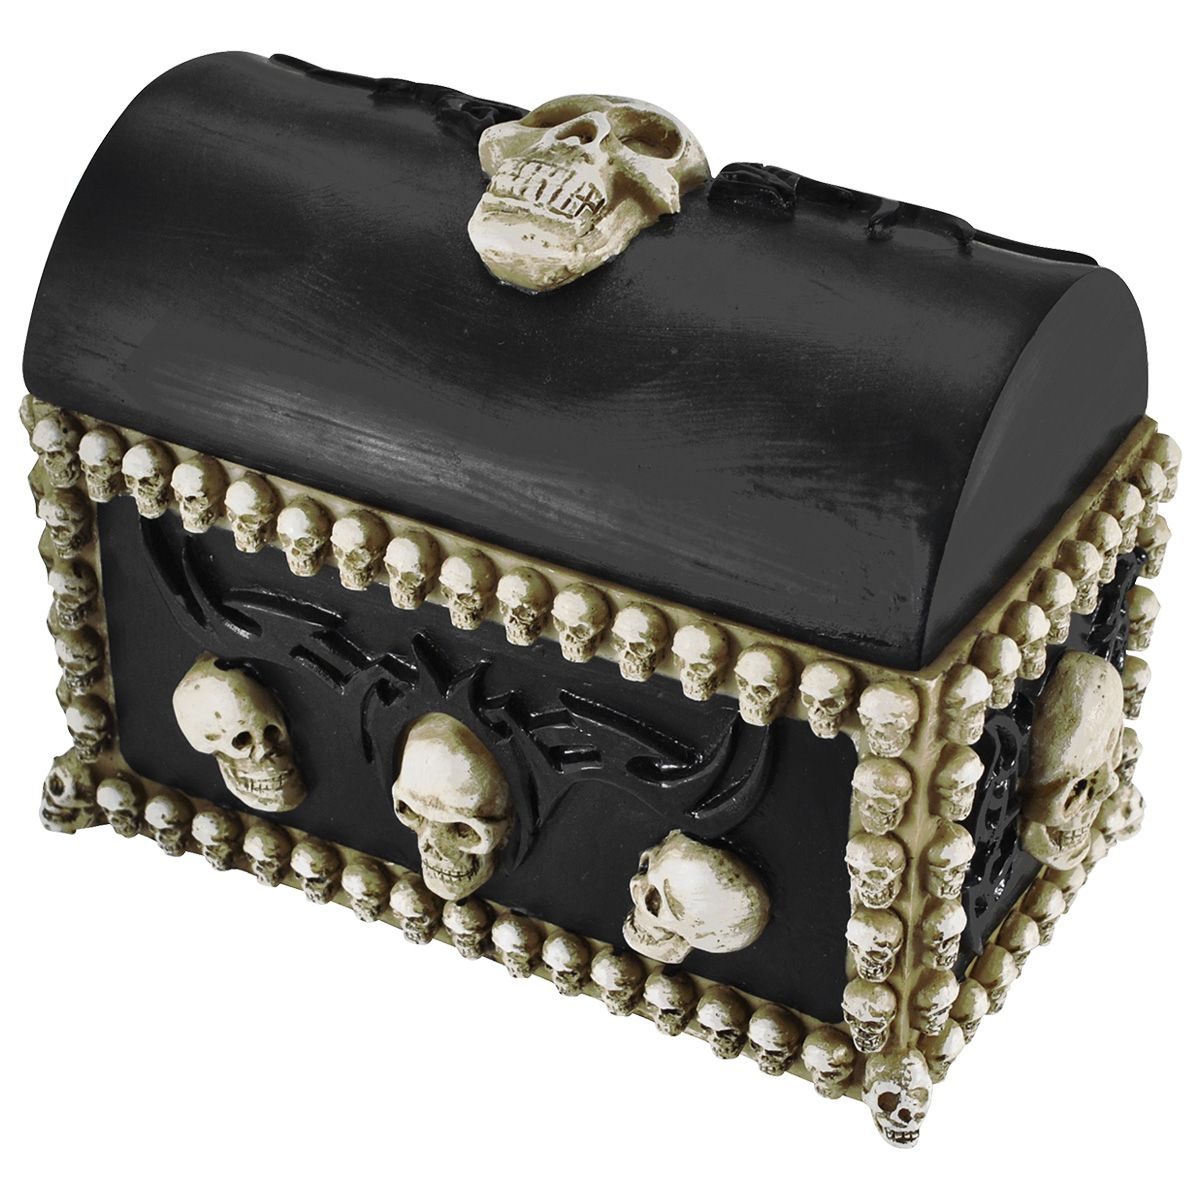 bo te dark d co coffre t tes de mort rock a gogo. Black Bedroom Furniture Sets. Home Design Ideas